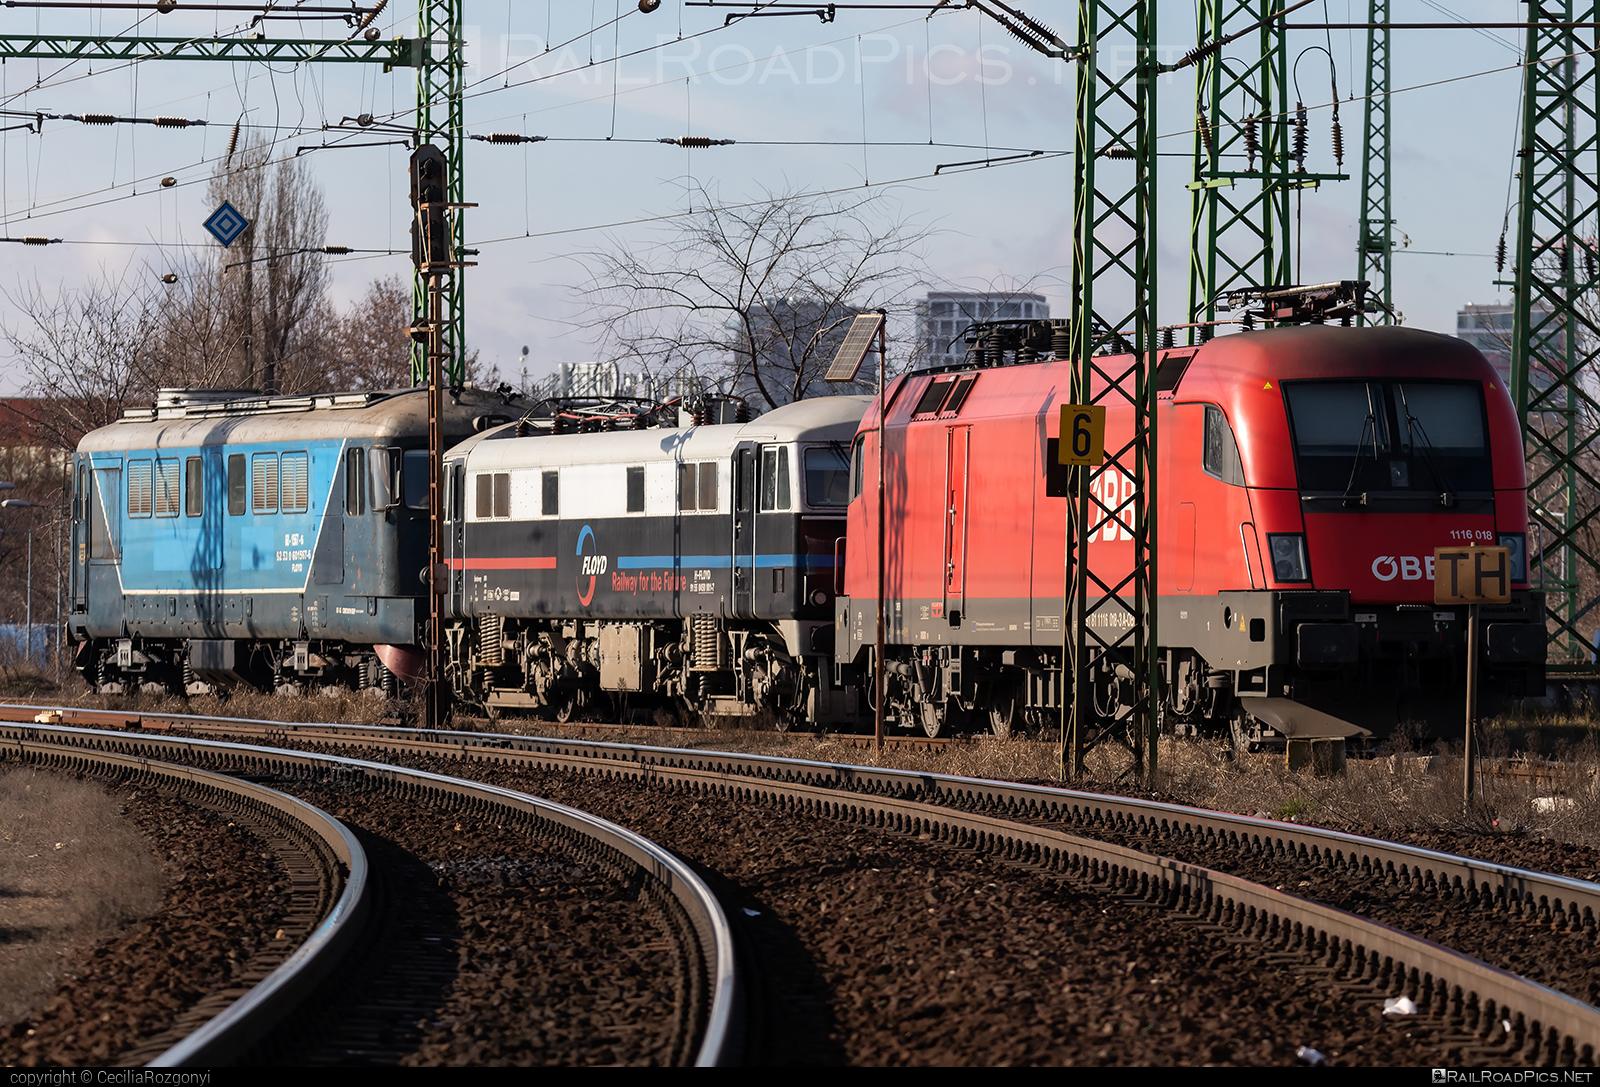 Siemens ES 64 U2 - 1116 018 operated by Rail Cargo Hungaria ZRt. #es64 #es64u #es64u2 #eurosprinter #rch #siemens #siemenses64 #siemenses64u #siemenses64u2 #siemenstaurus #tauruslocomotive